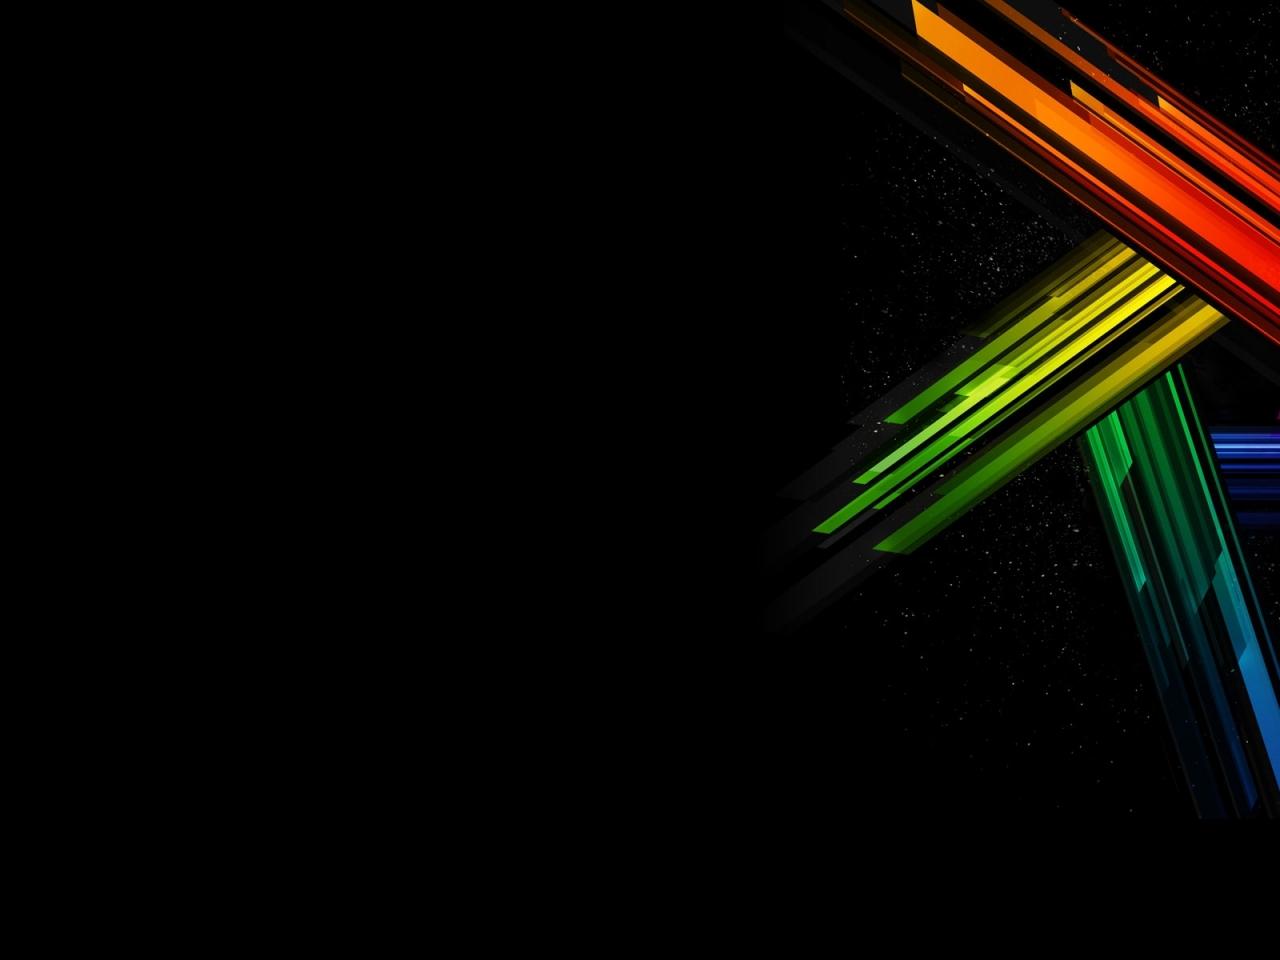 Green And Black Iphone Wallpaper  22 Desktop Background